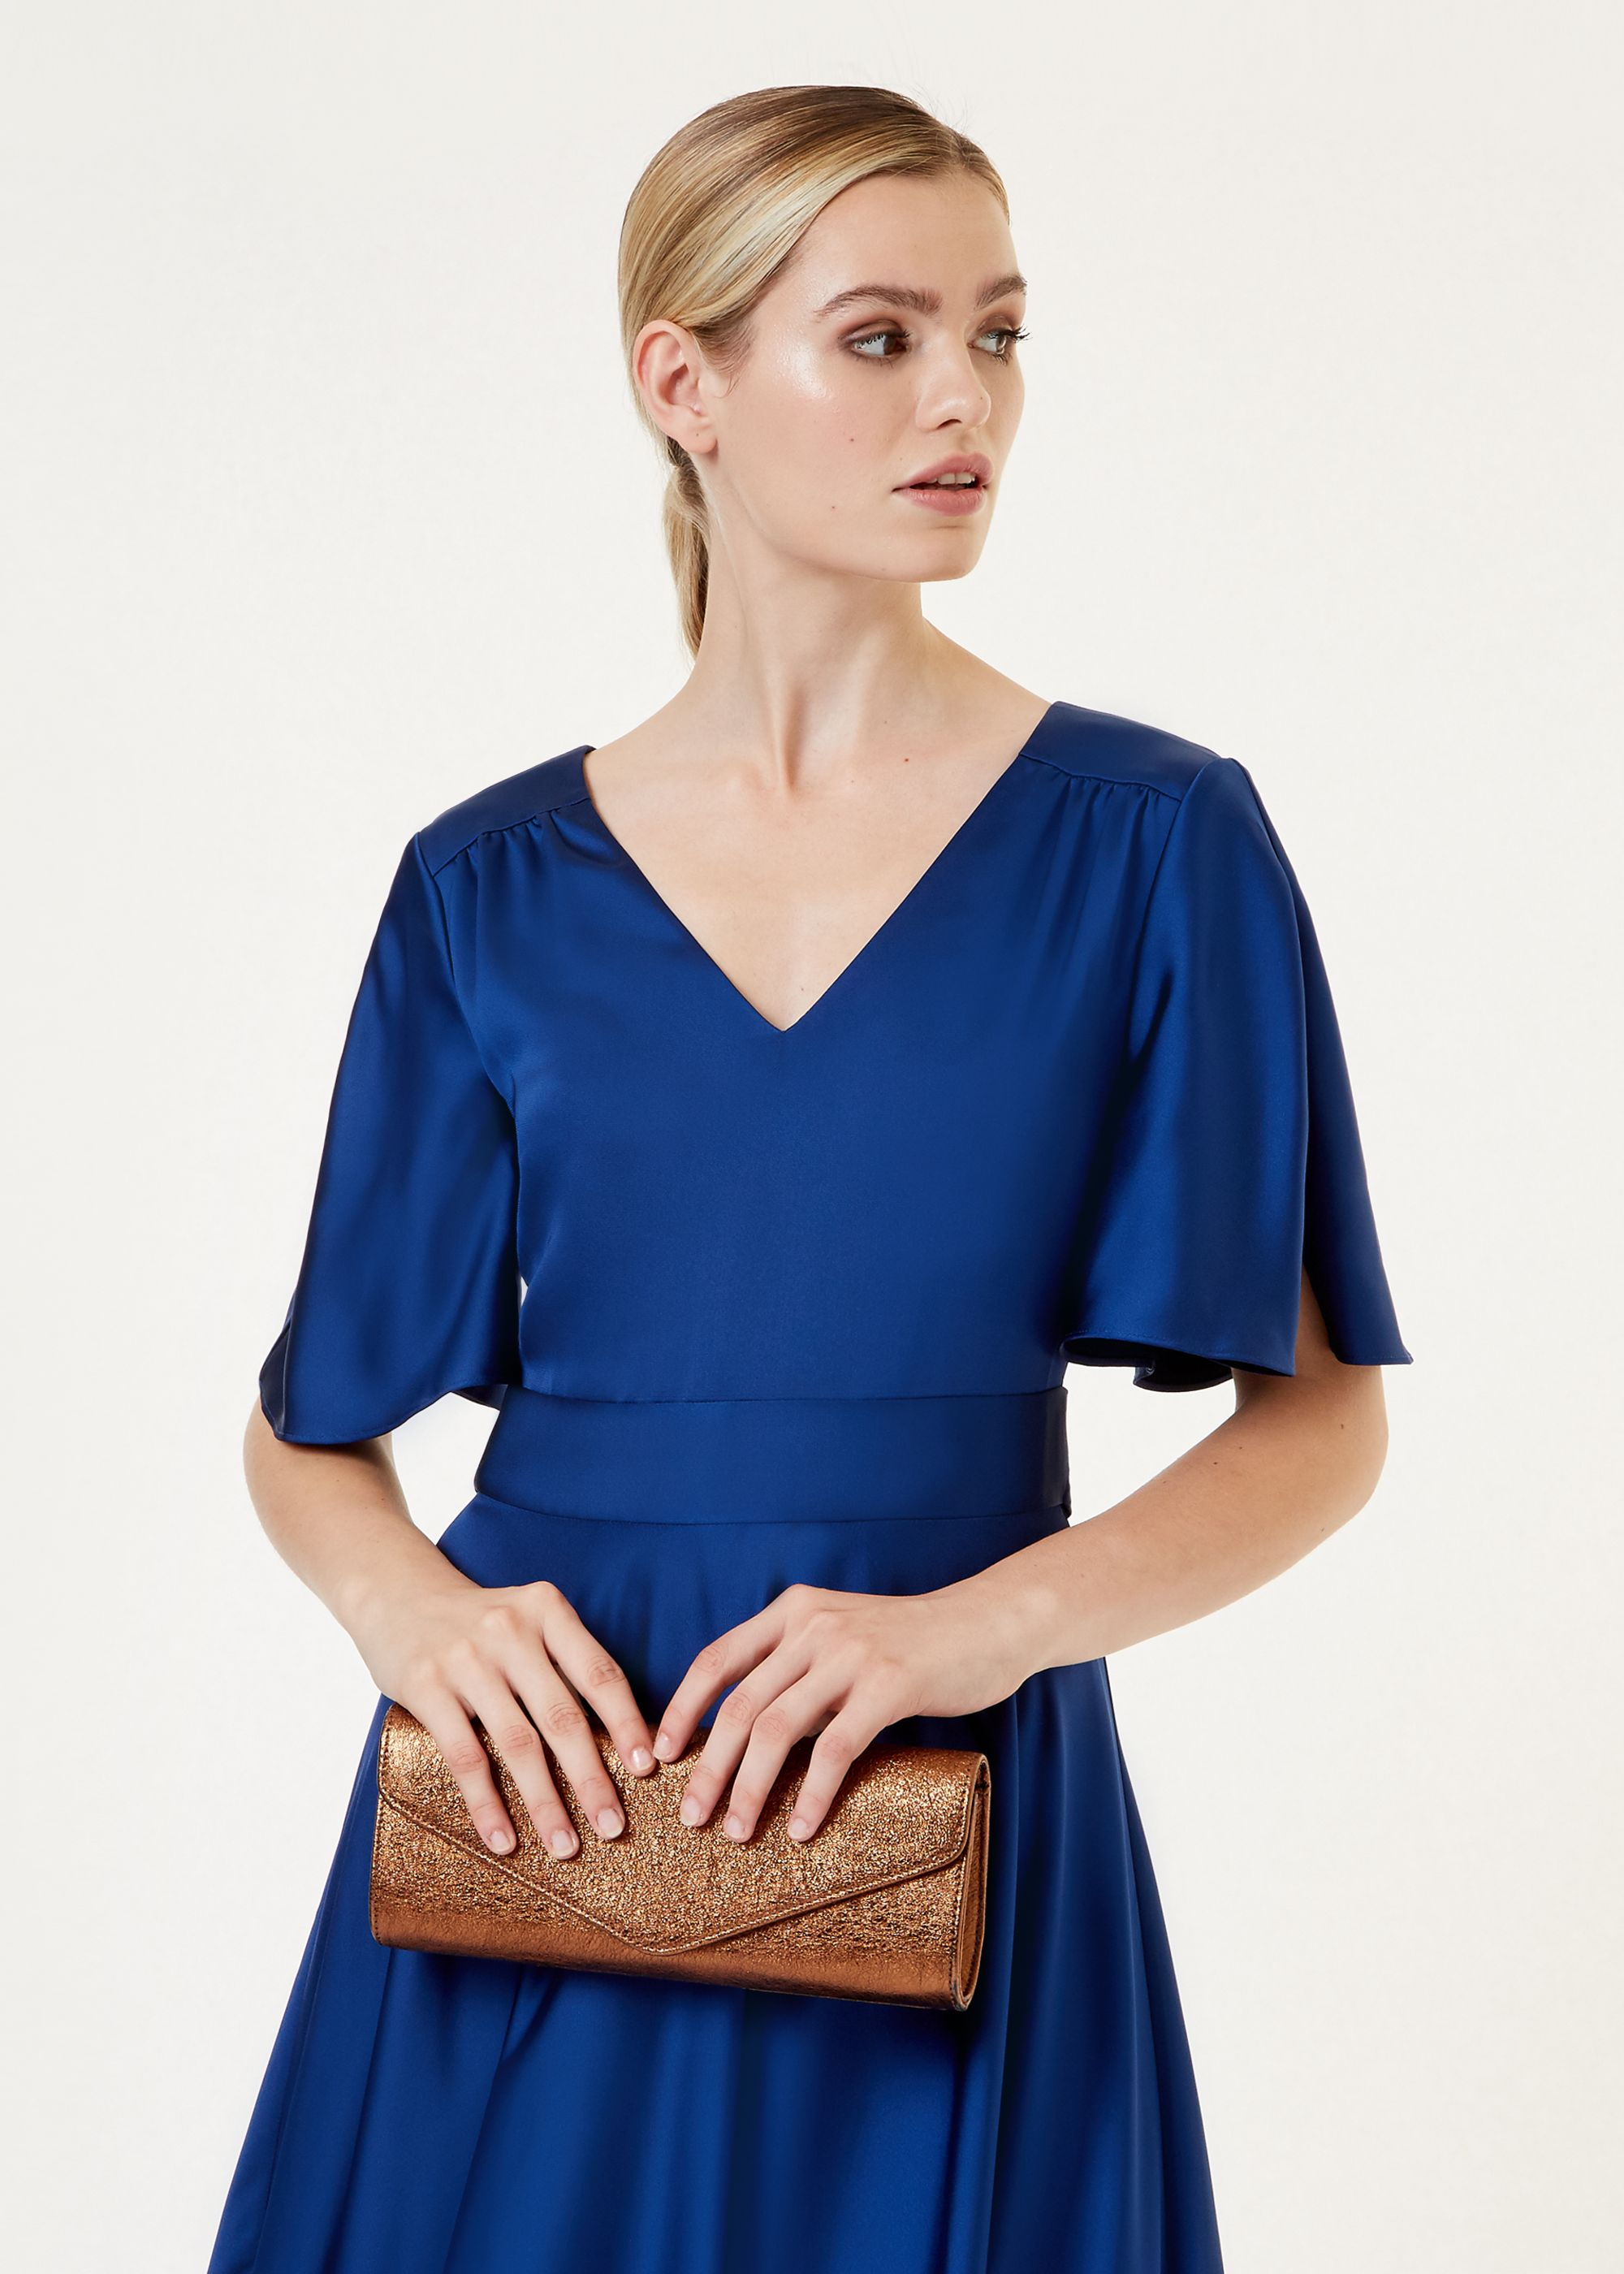 Hobbs Women Evie Clutch Bag